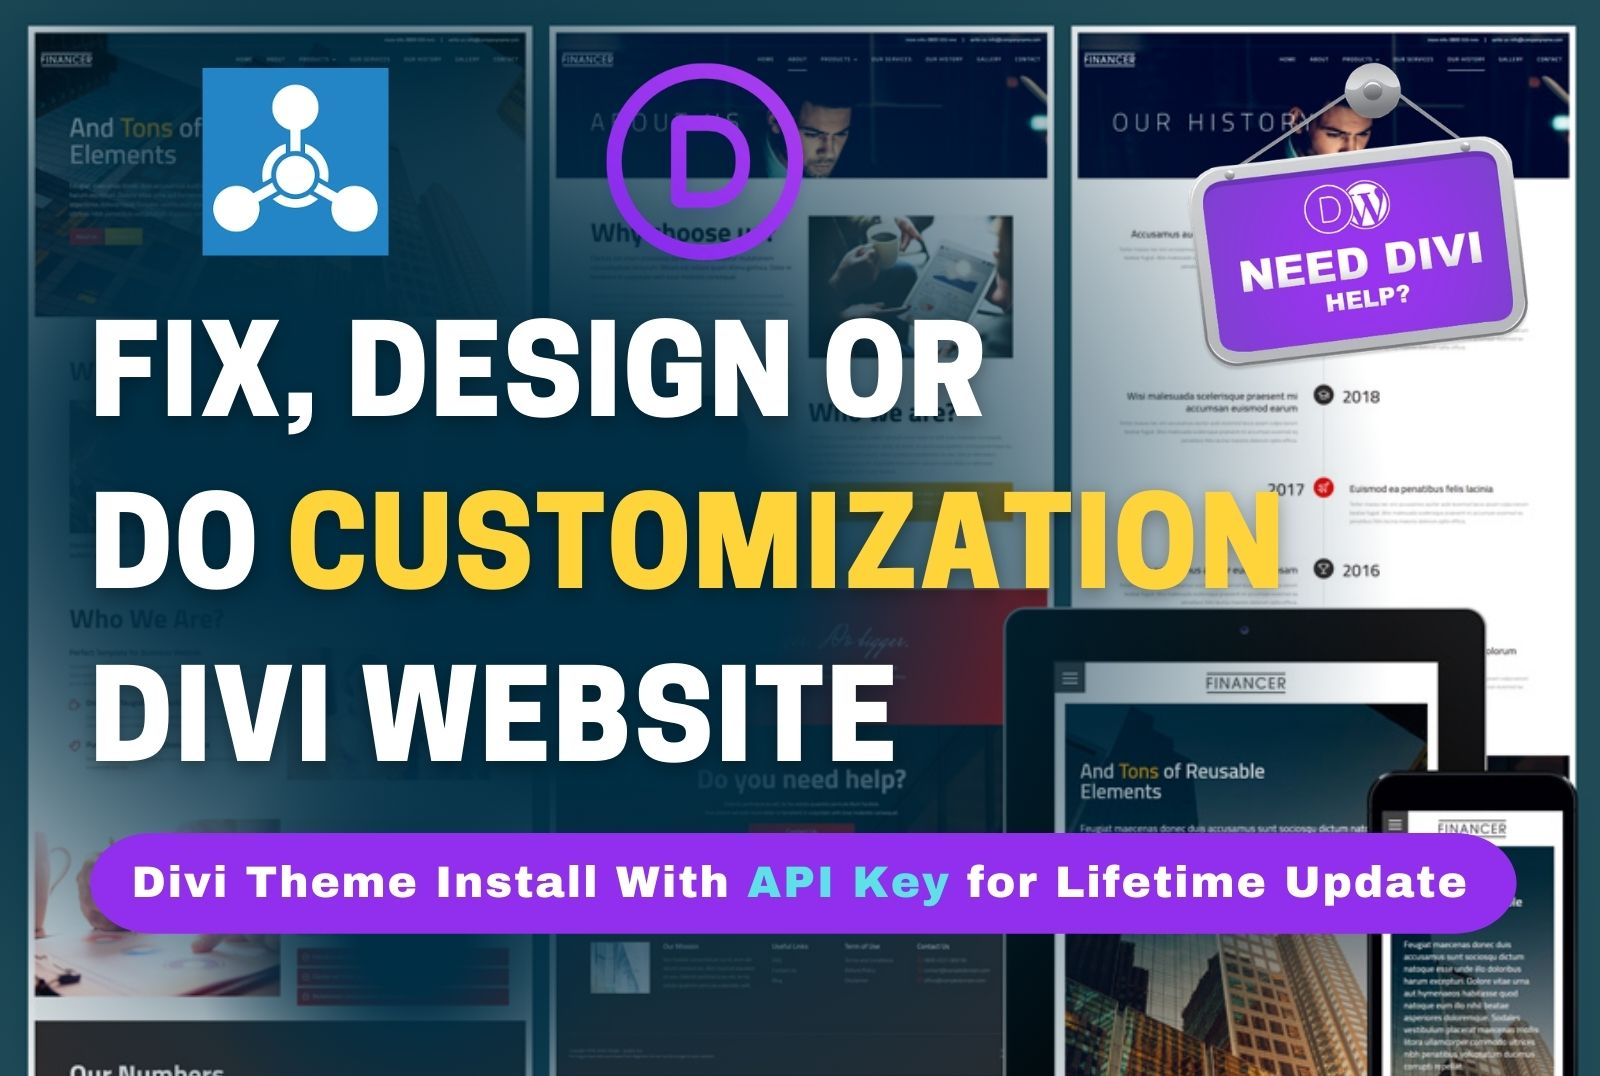 I am expert to build Divi website,  Divi theme customization,  Divi error fixing